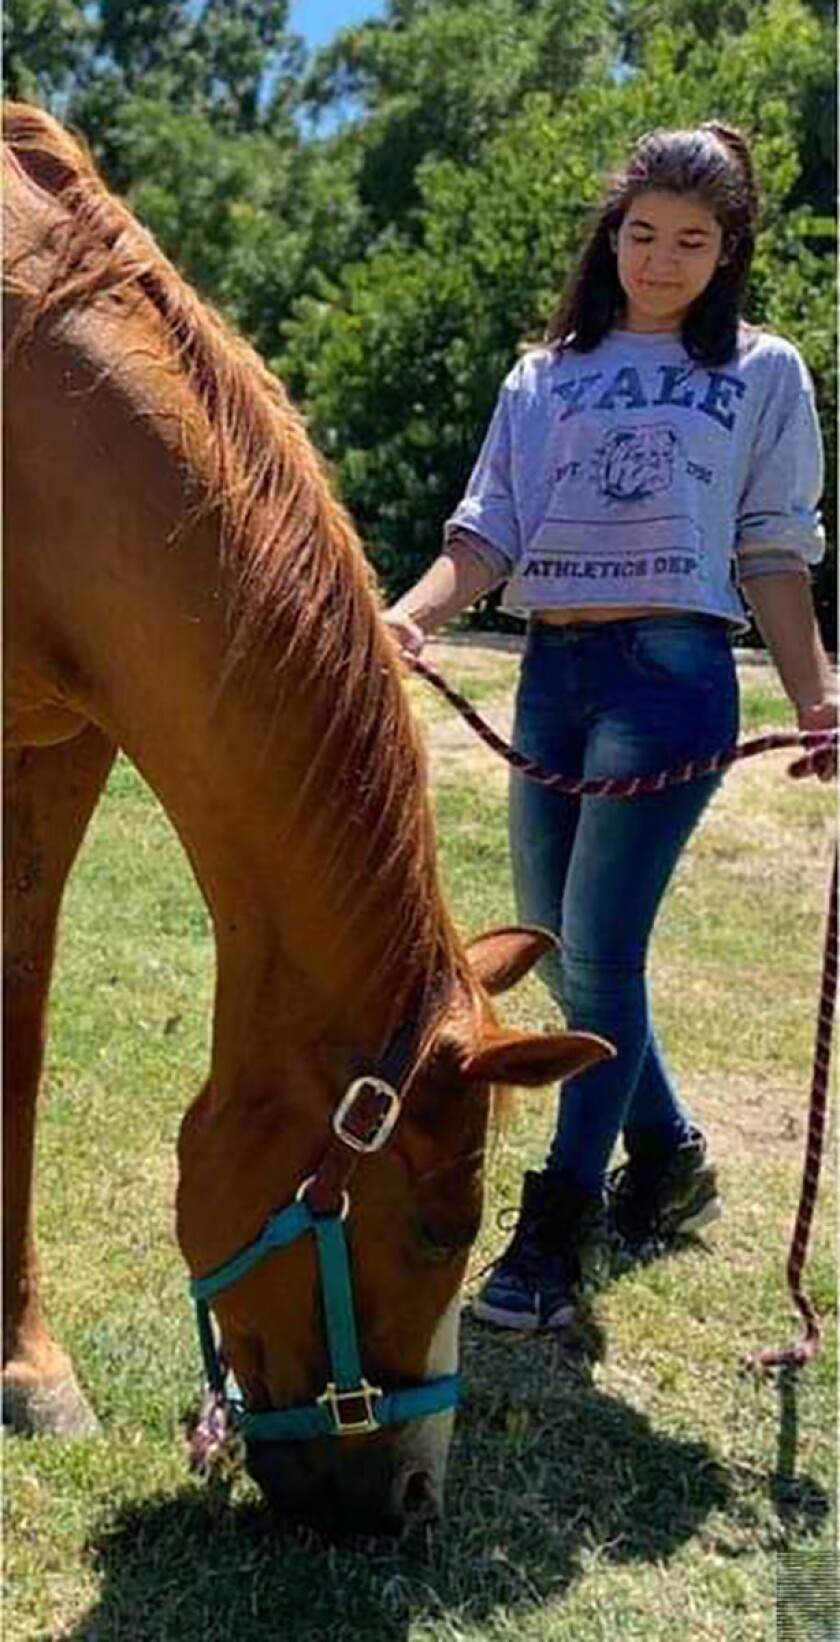 Summer Gardner-Vigil and her horse, Riggs.